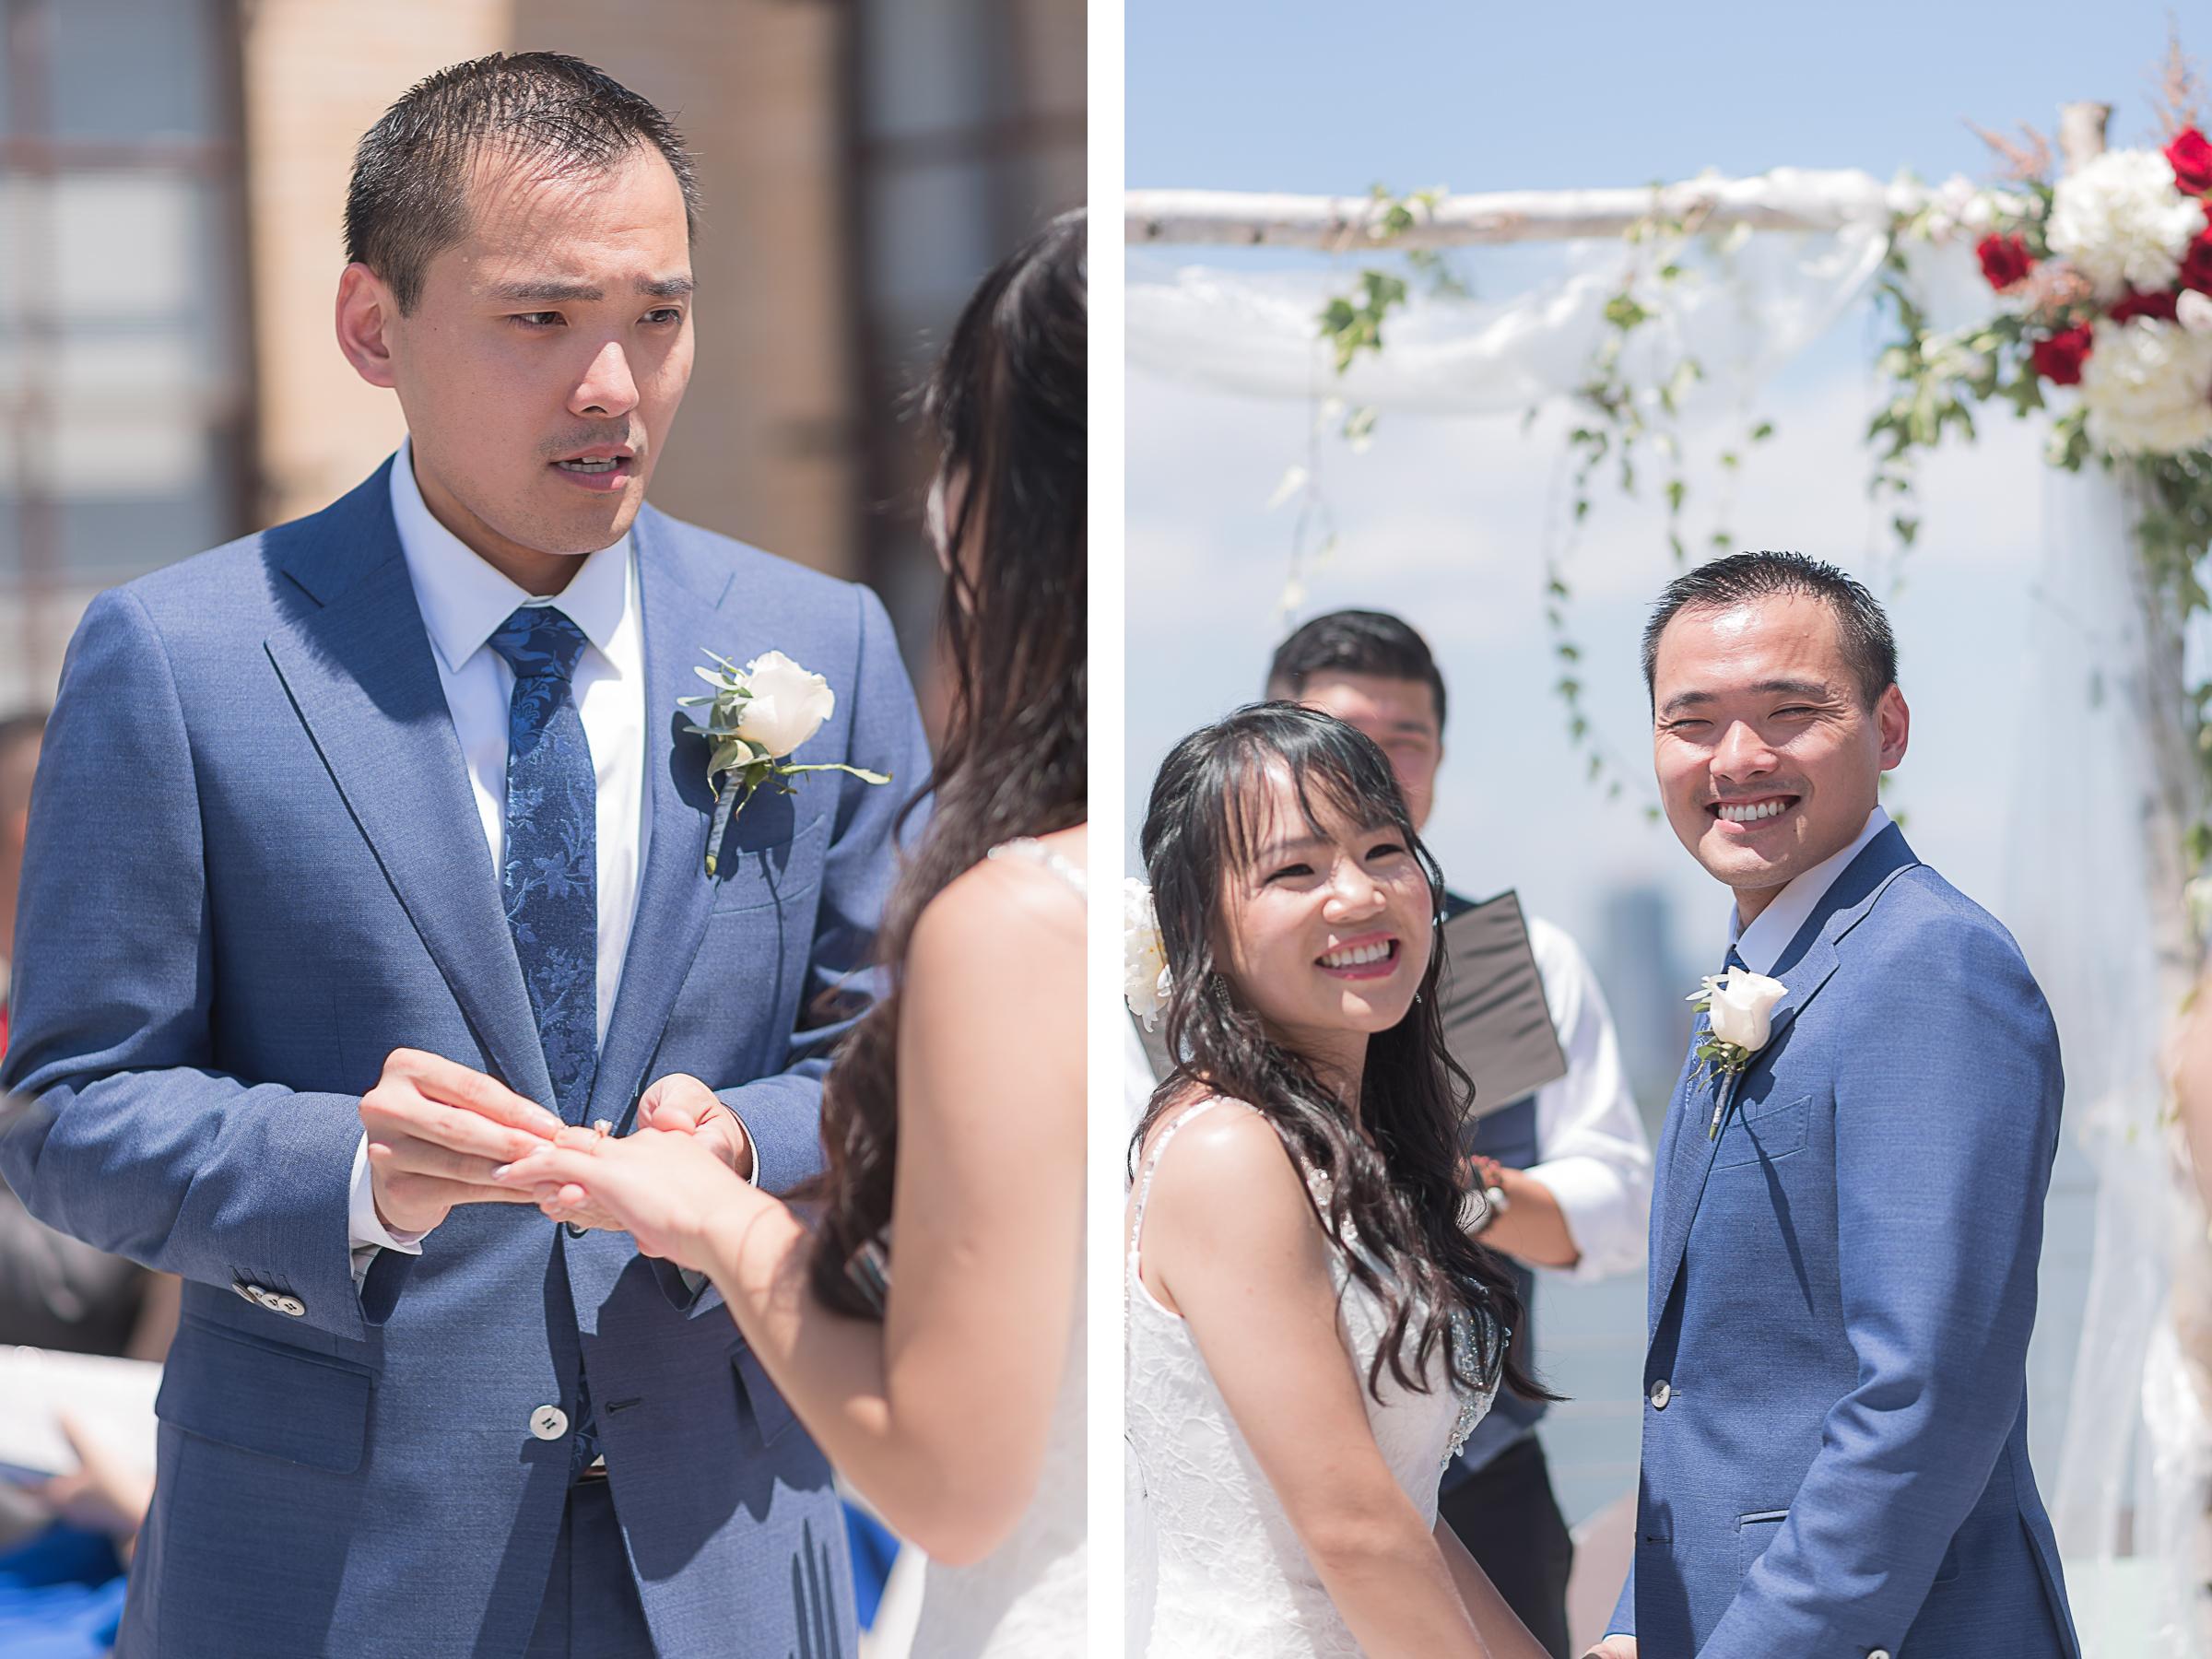 NYC-Ramscale-Wedding-Bride-Groom-Ceremony.jpg